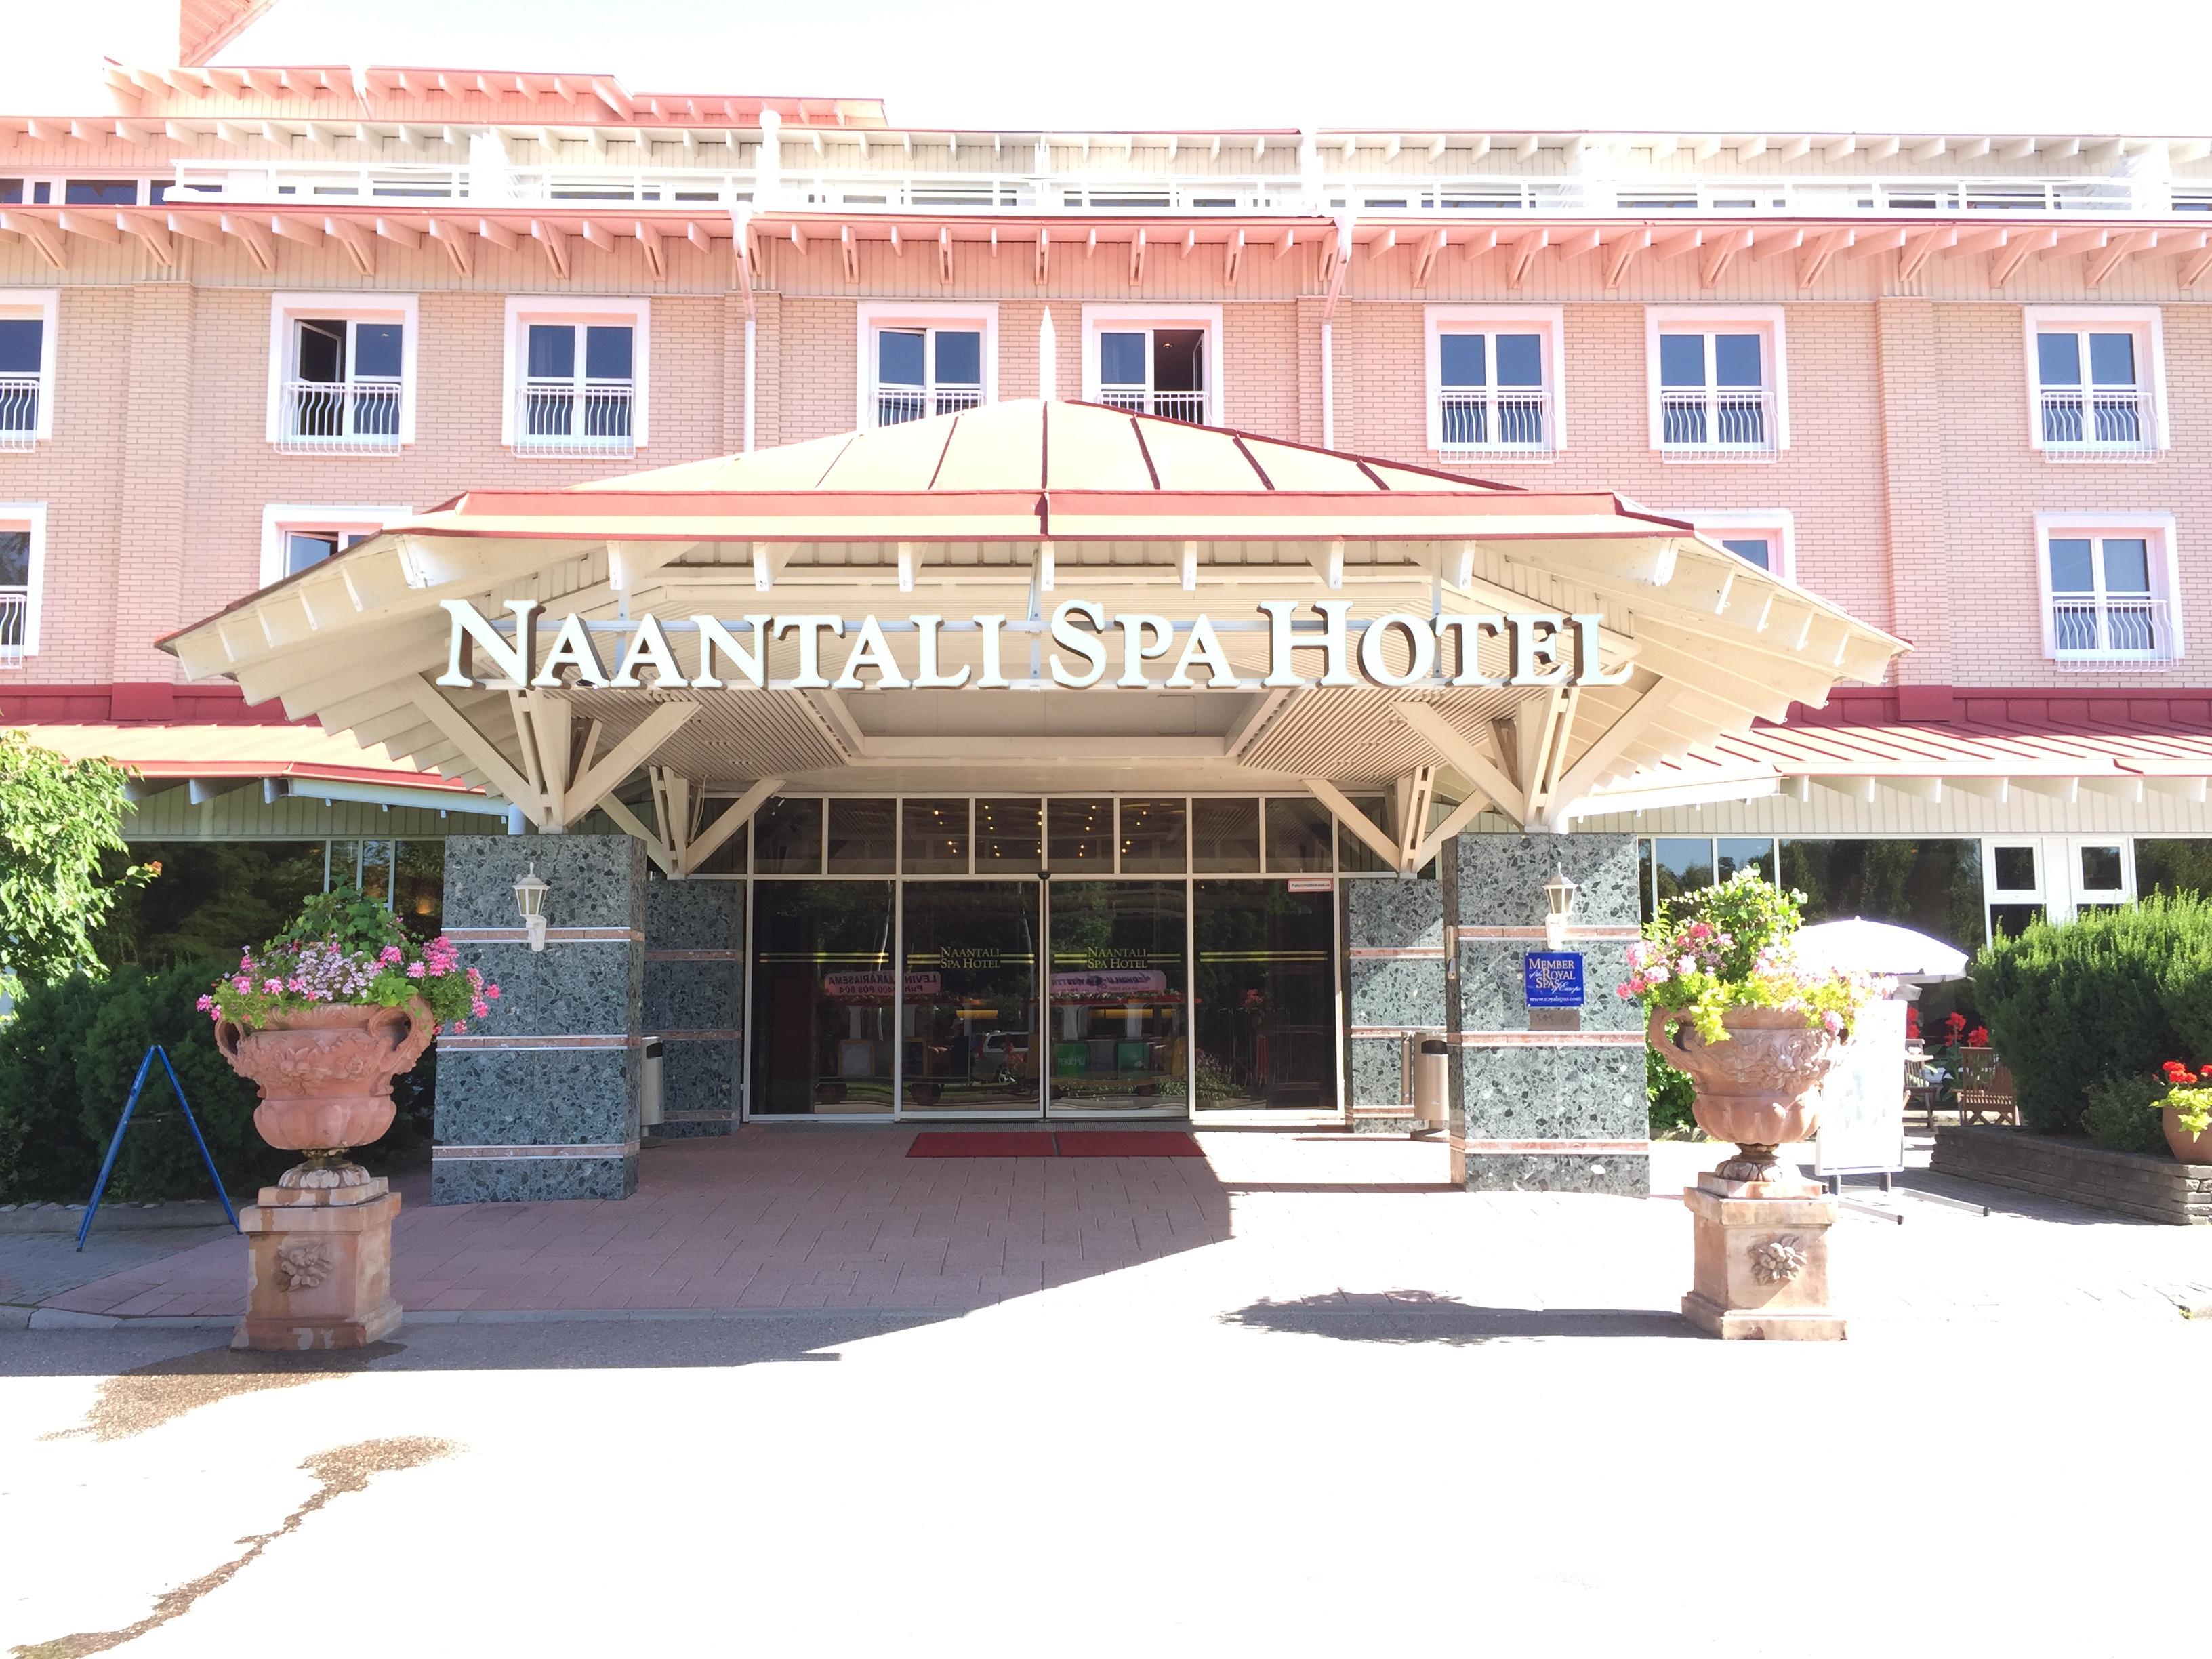 Lahjakortit - Naantali Spa Hotel